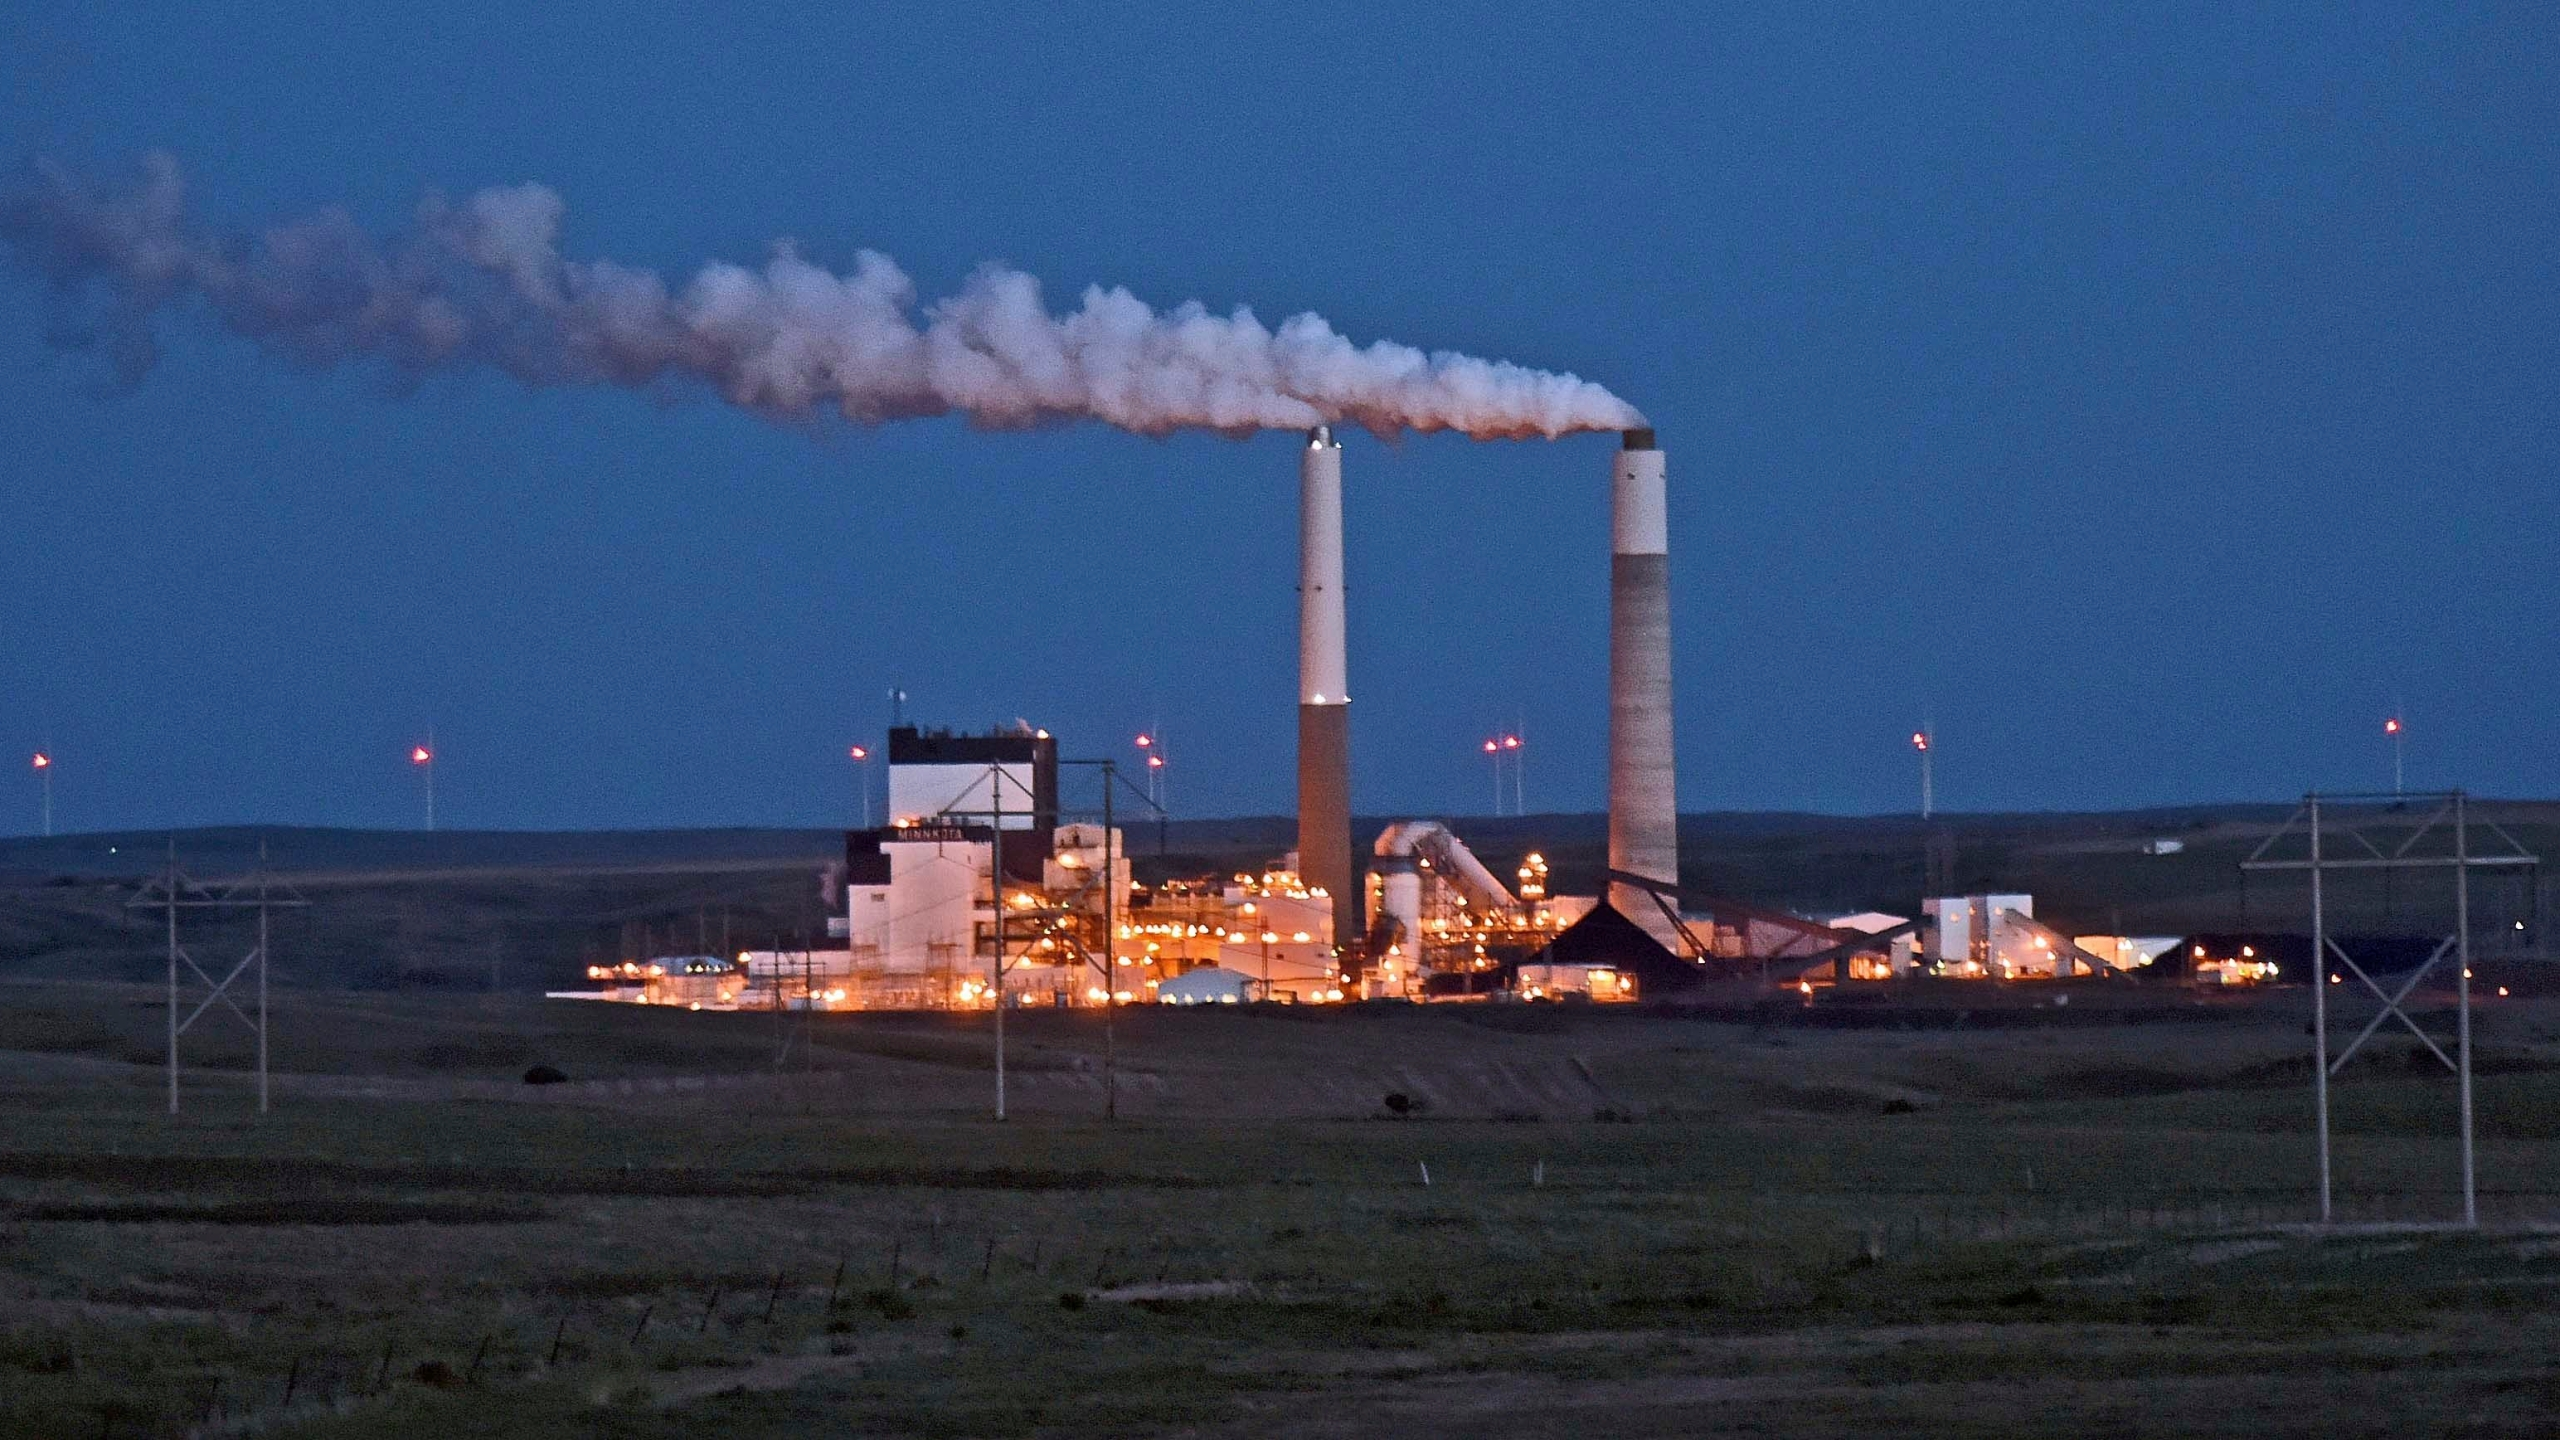 Power_Plants-Air_Quality_65892-159532.jpg95792784